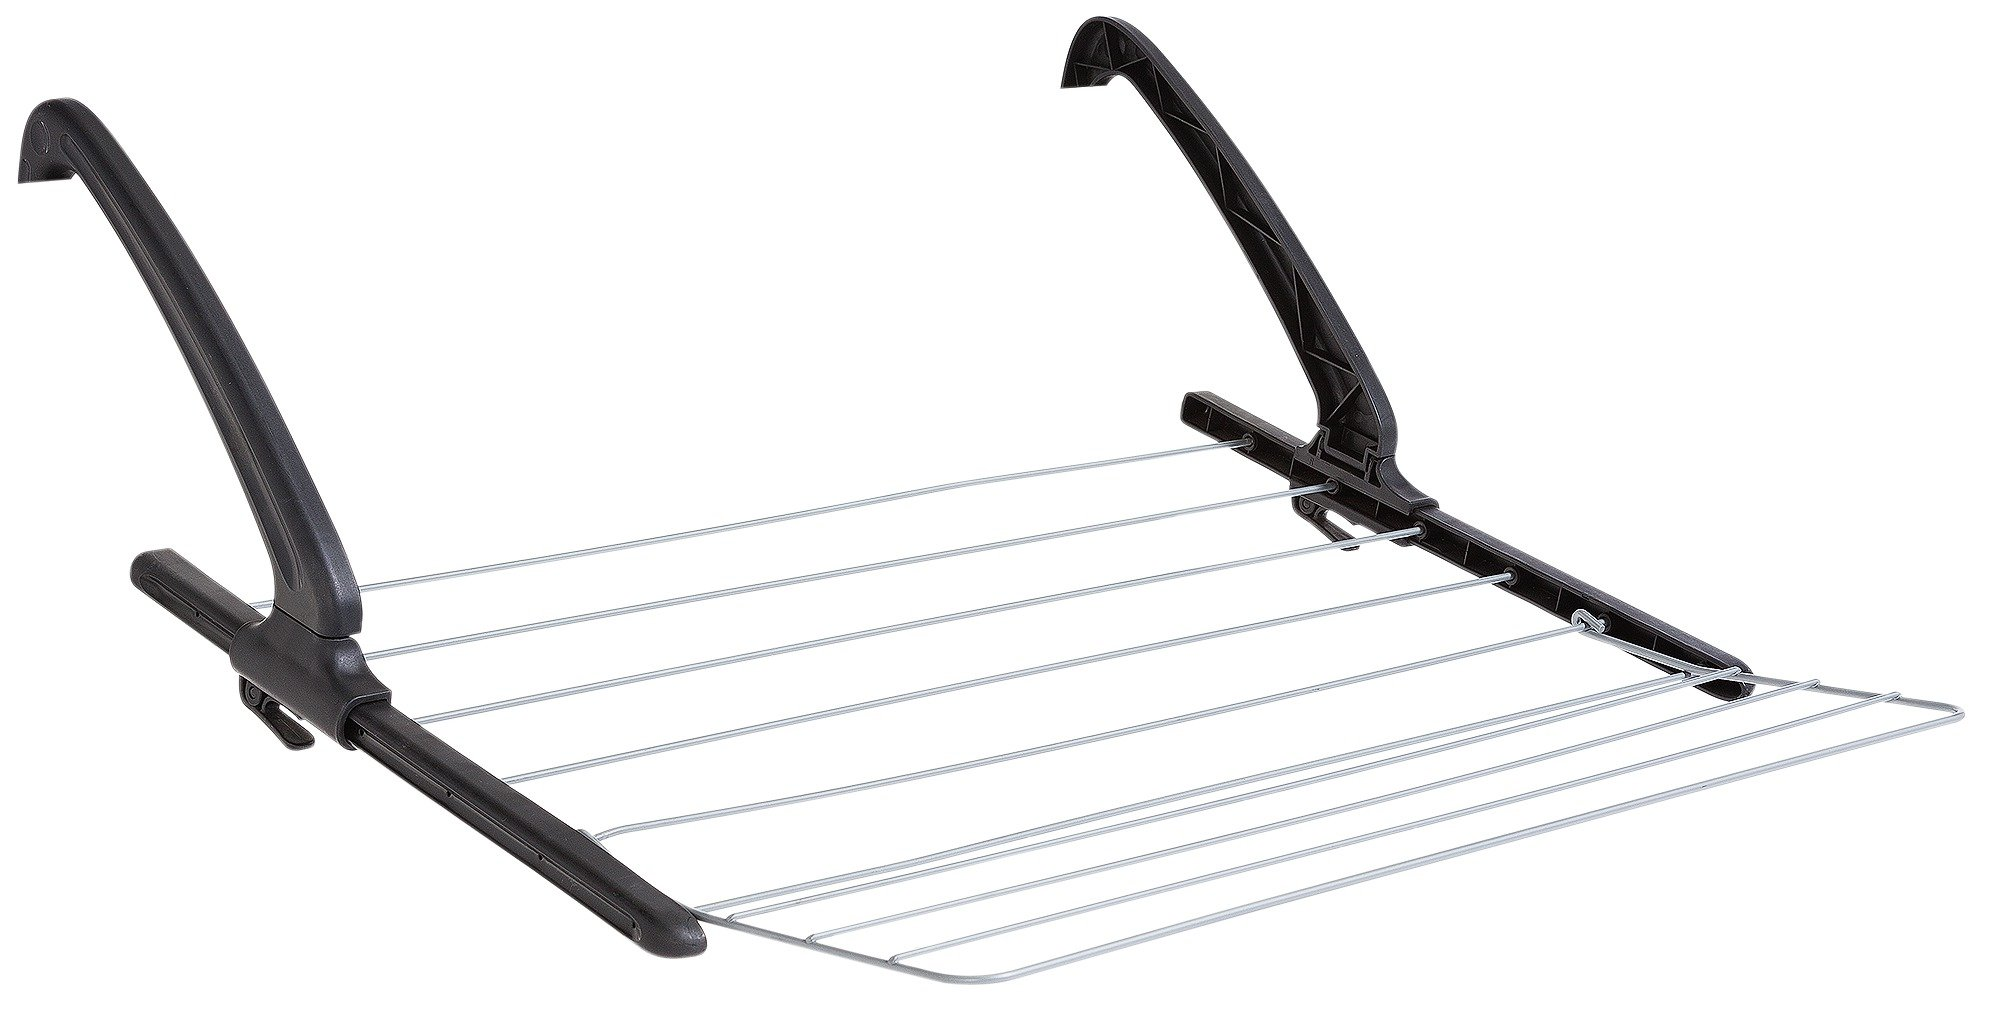 better dri 6m extendable radiator airer review. Black Bedroom Furniture Sets. Home Design Ideas